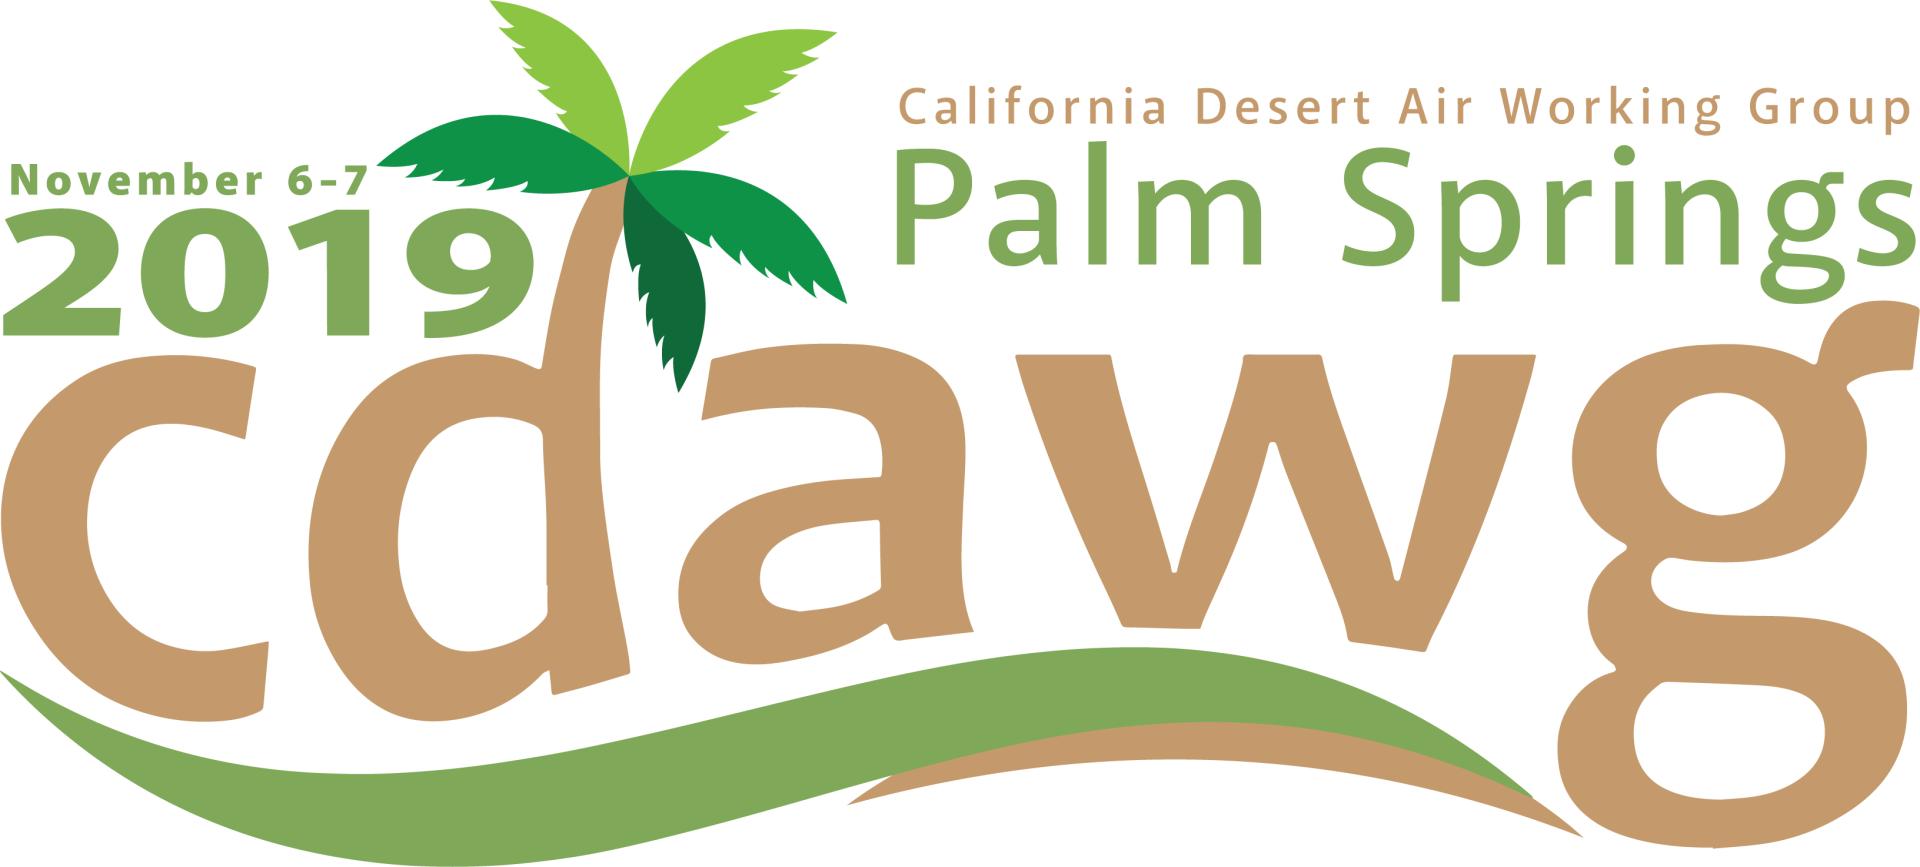 2019 CDAWG Logo - v1